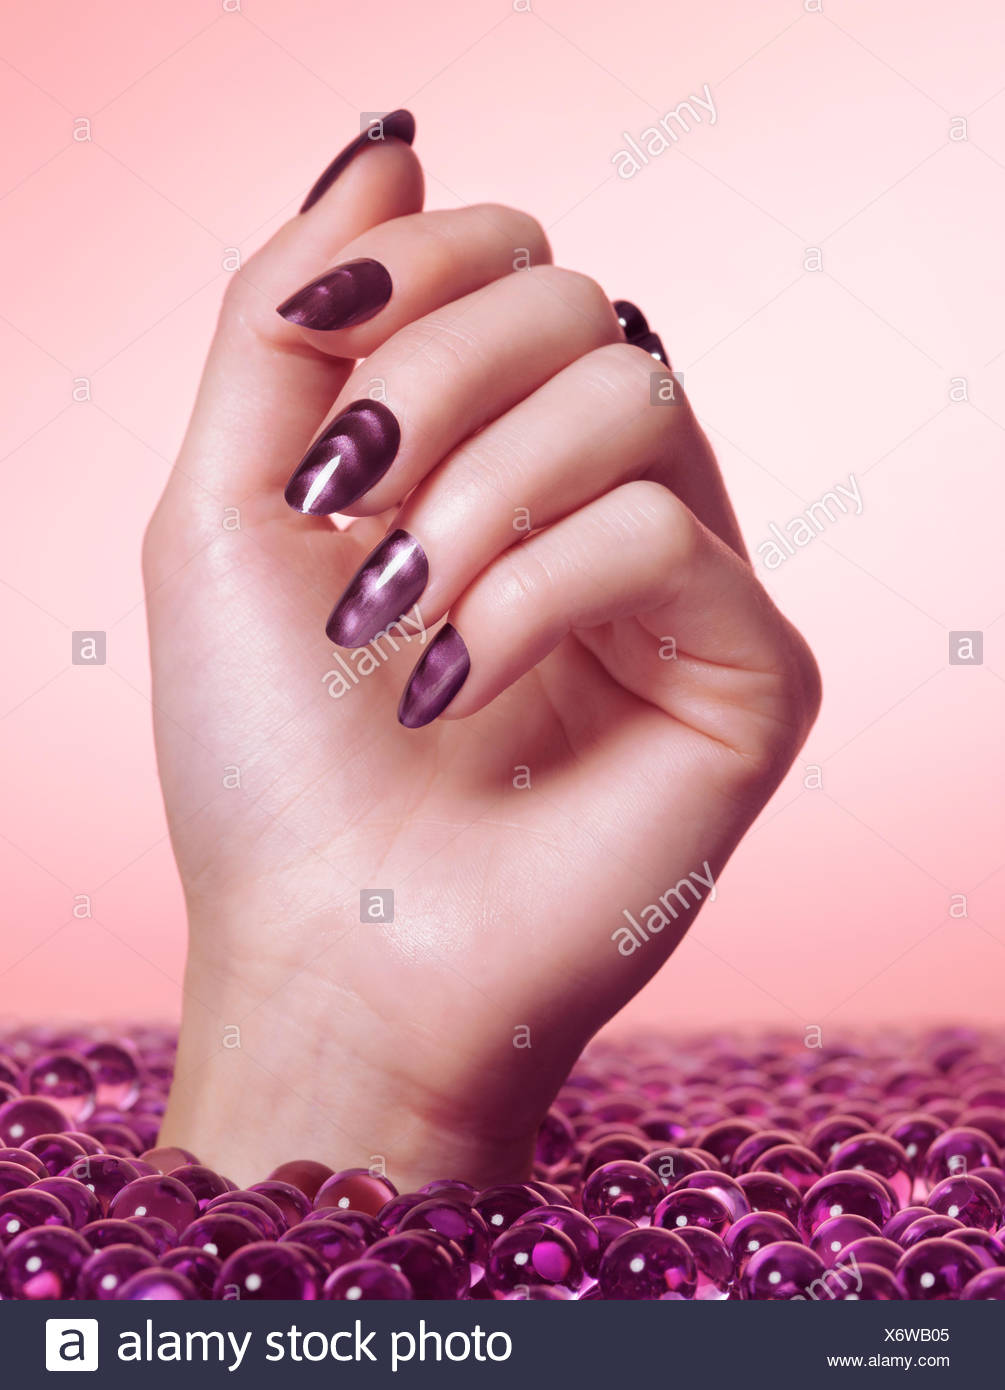 Fantástico Arte Púrpura Y Blanco De Uñas Viñeta - Ideas de Diseño de ...